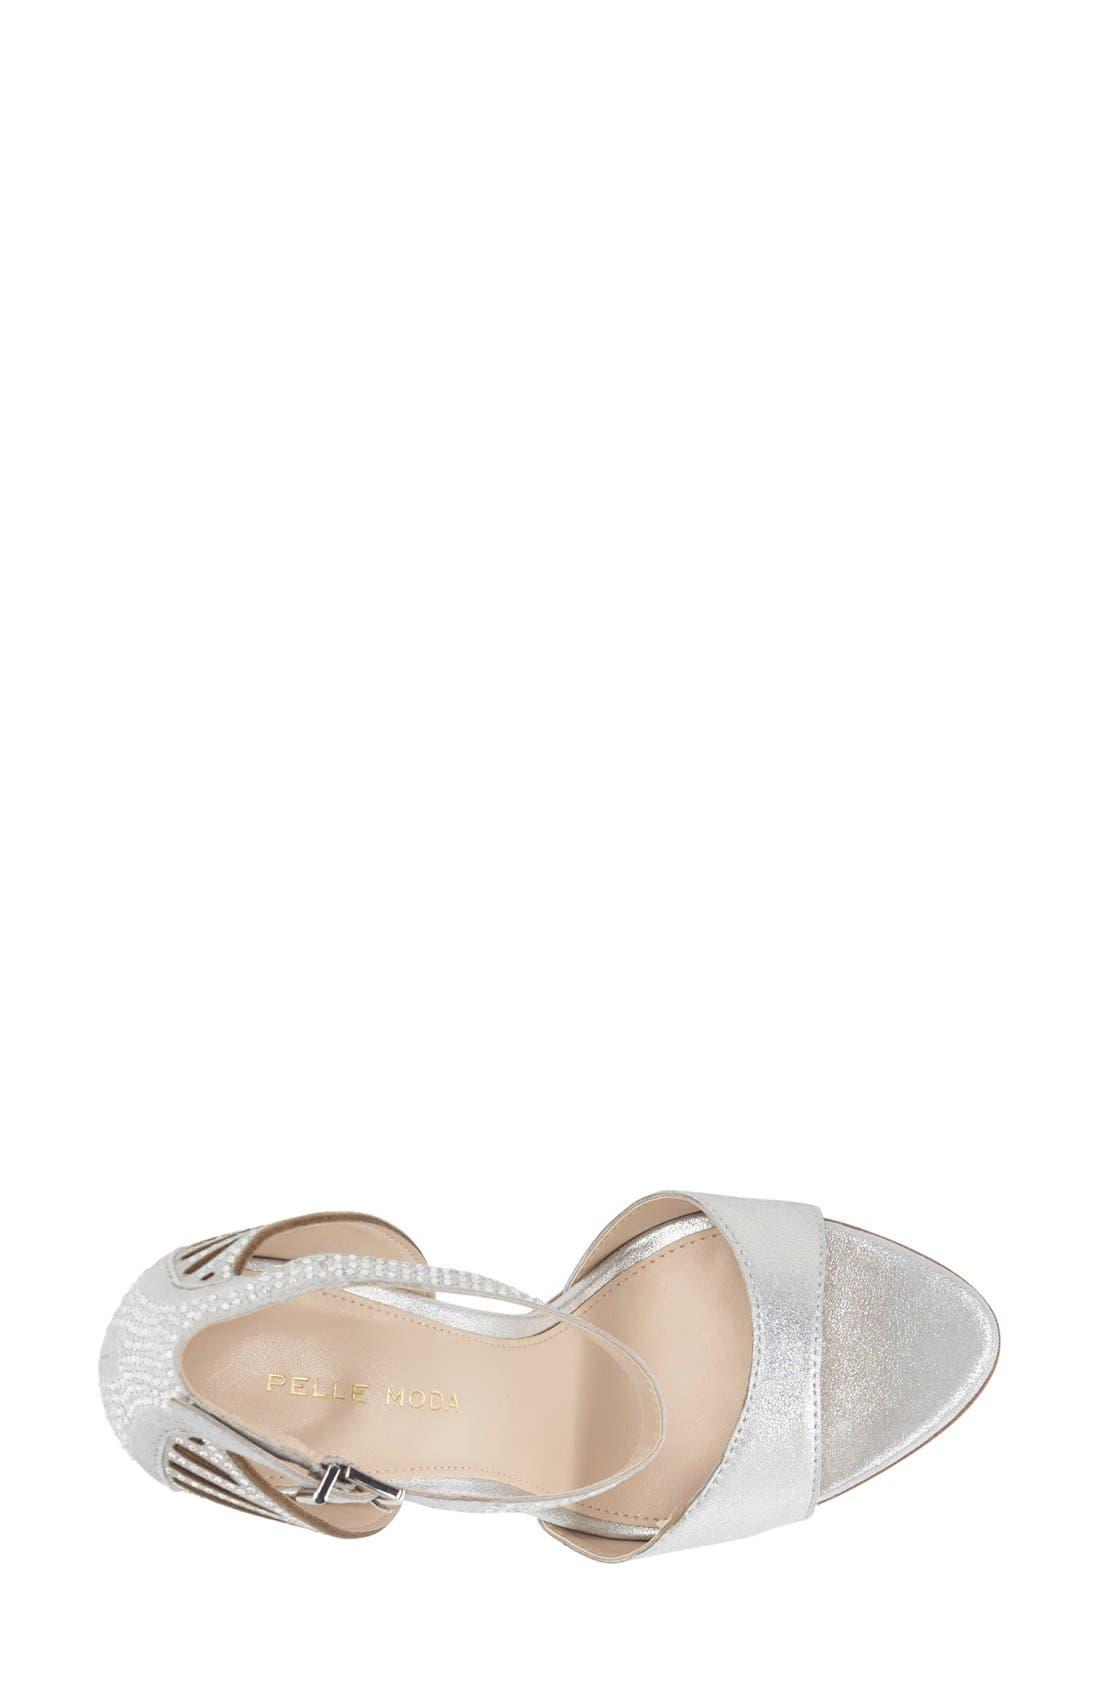 'Fenton' Ankle Strap Sandal,                             Alternate thumbnail 25, color,